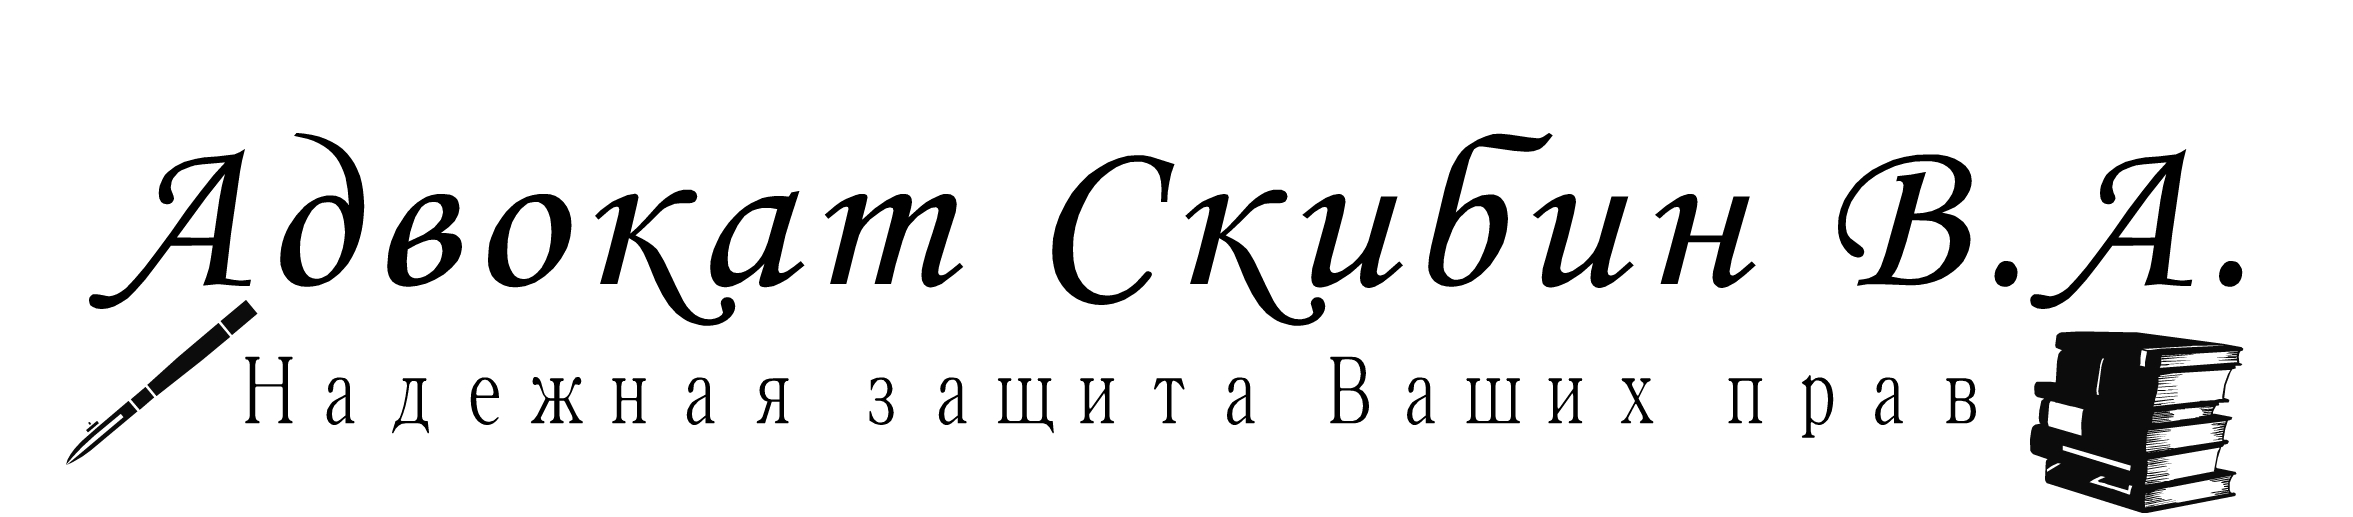 Адвокат в Краснодаре Скибин В.А.